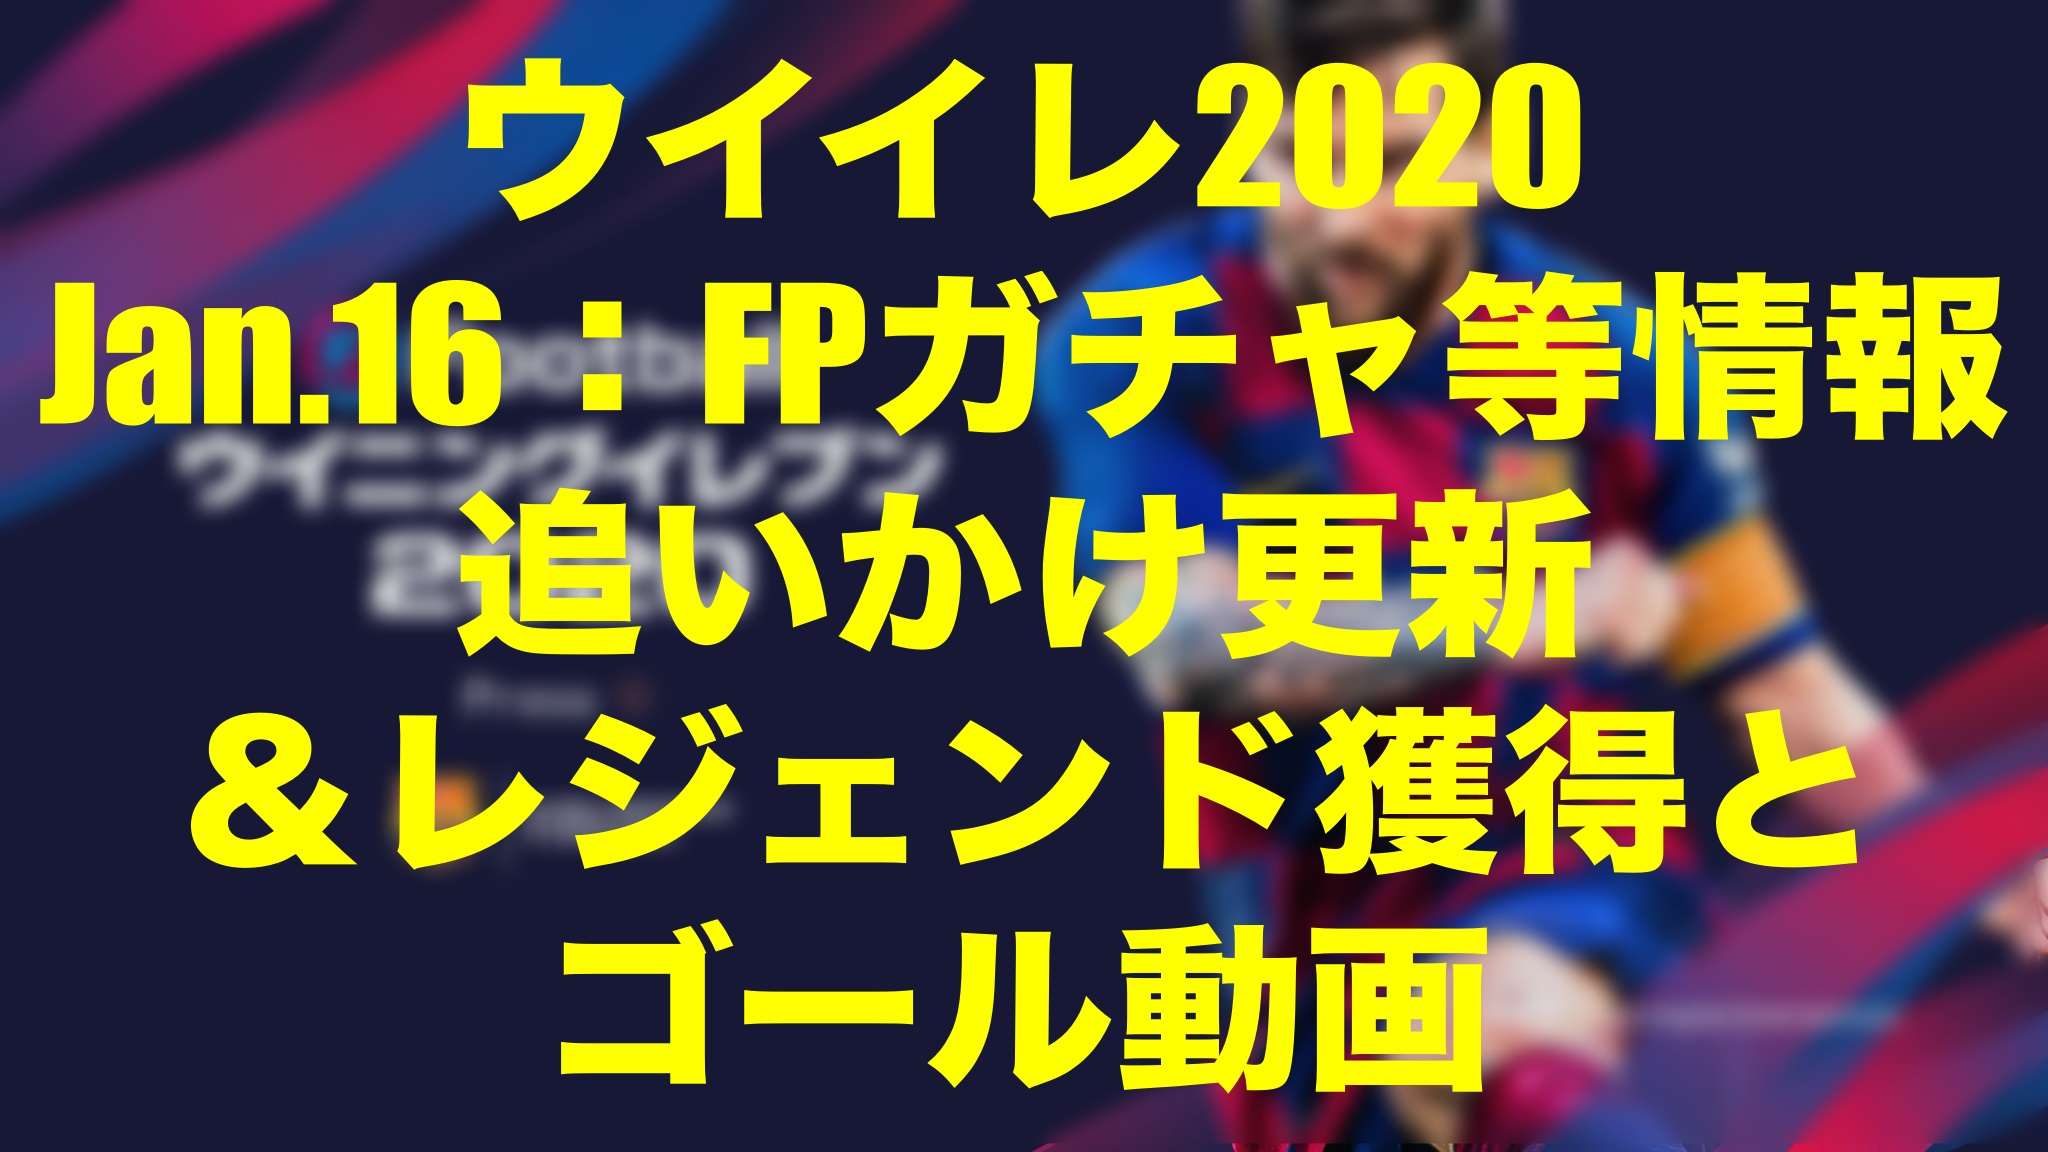 2020fp ガチャ ウイイレ